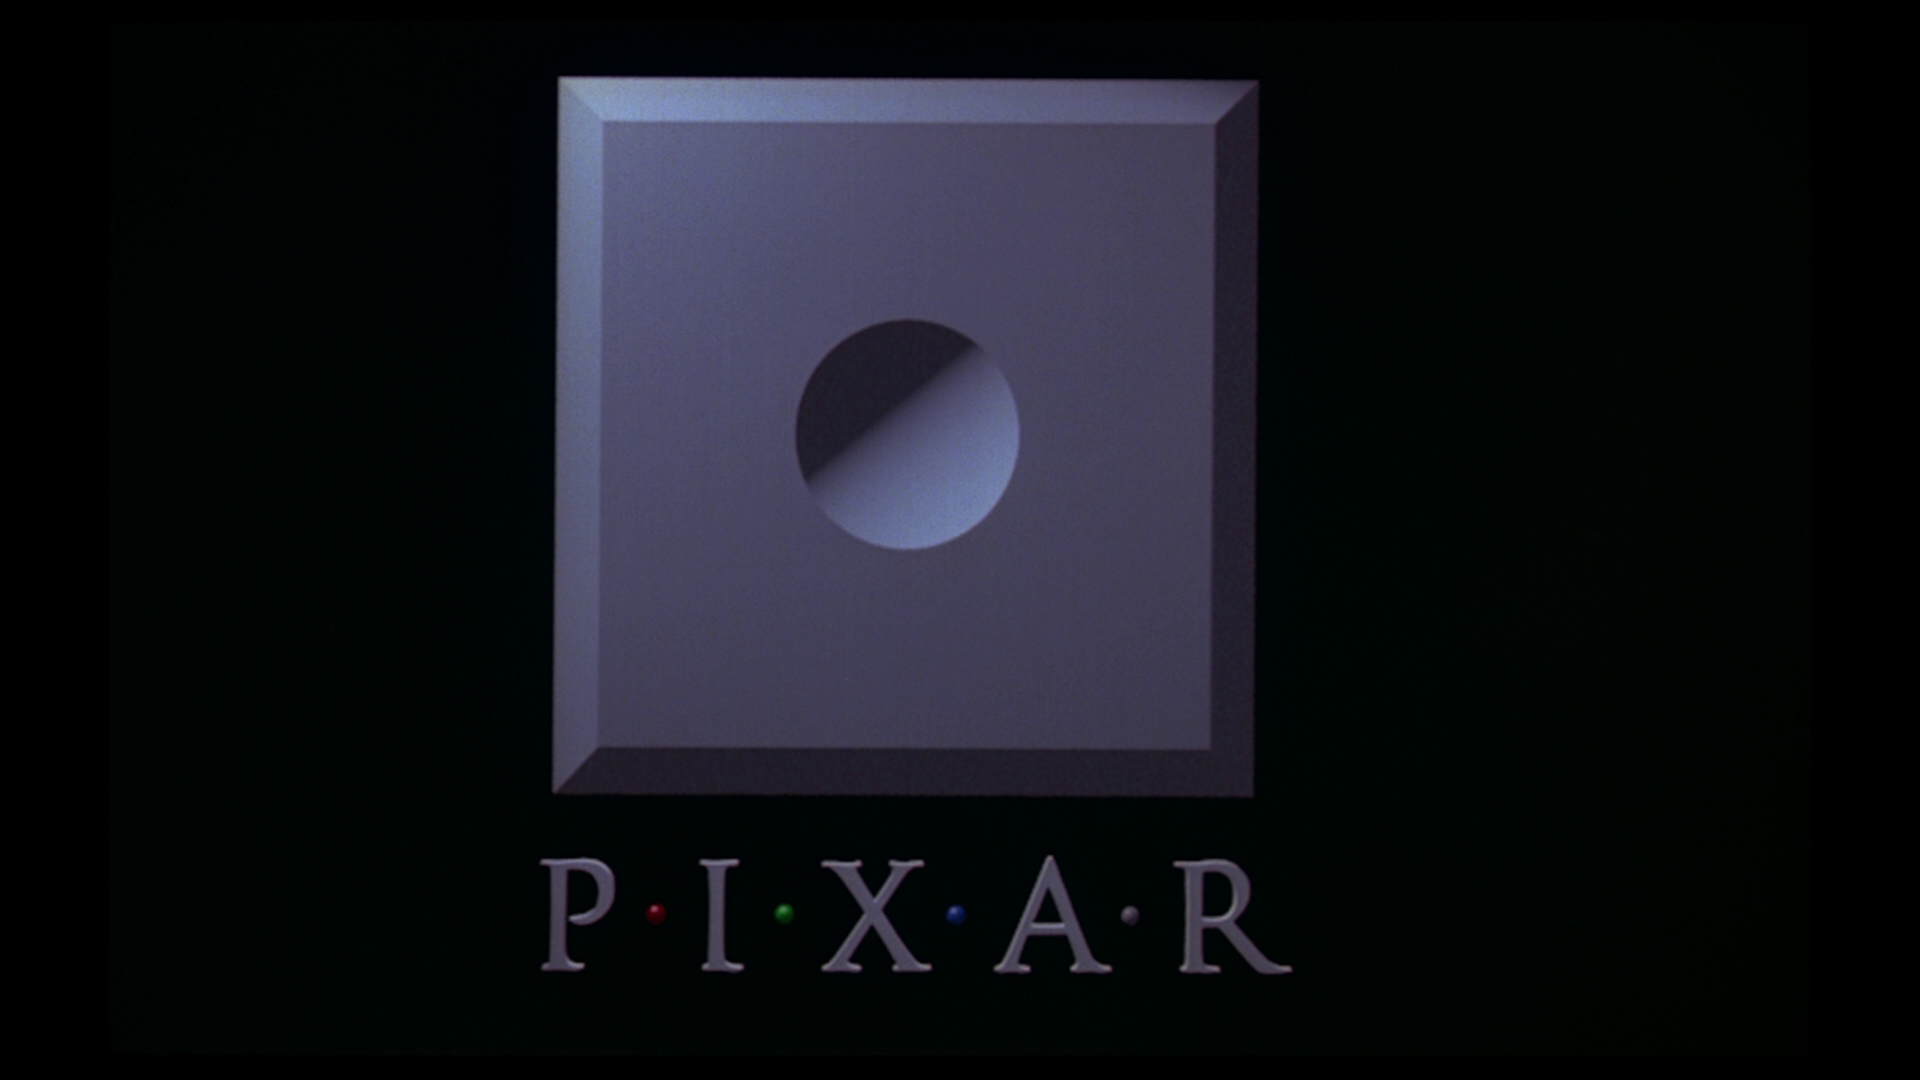 Pixar Animation Studios/On-screen Logos